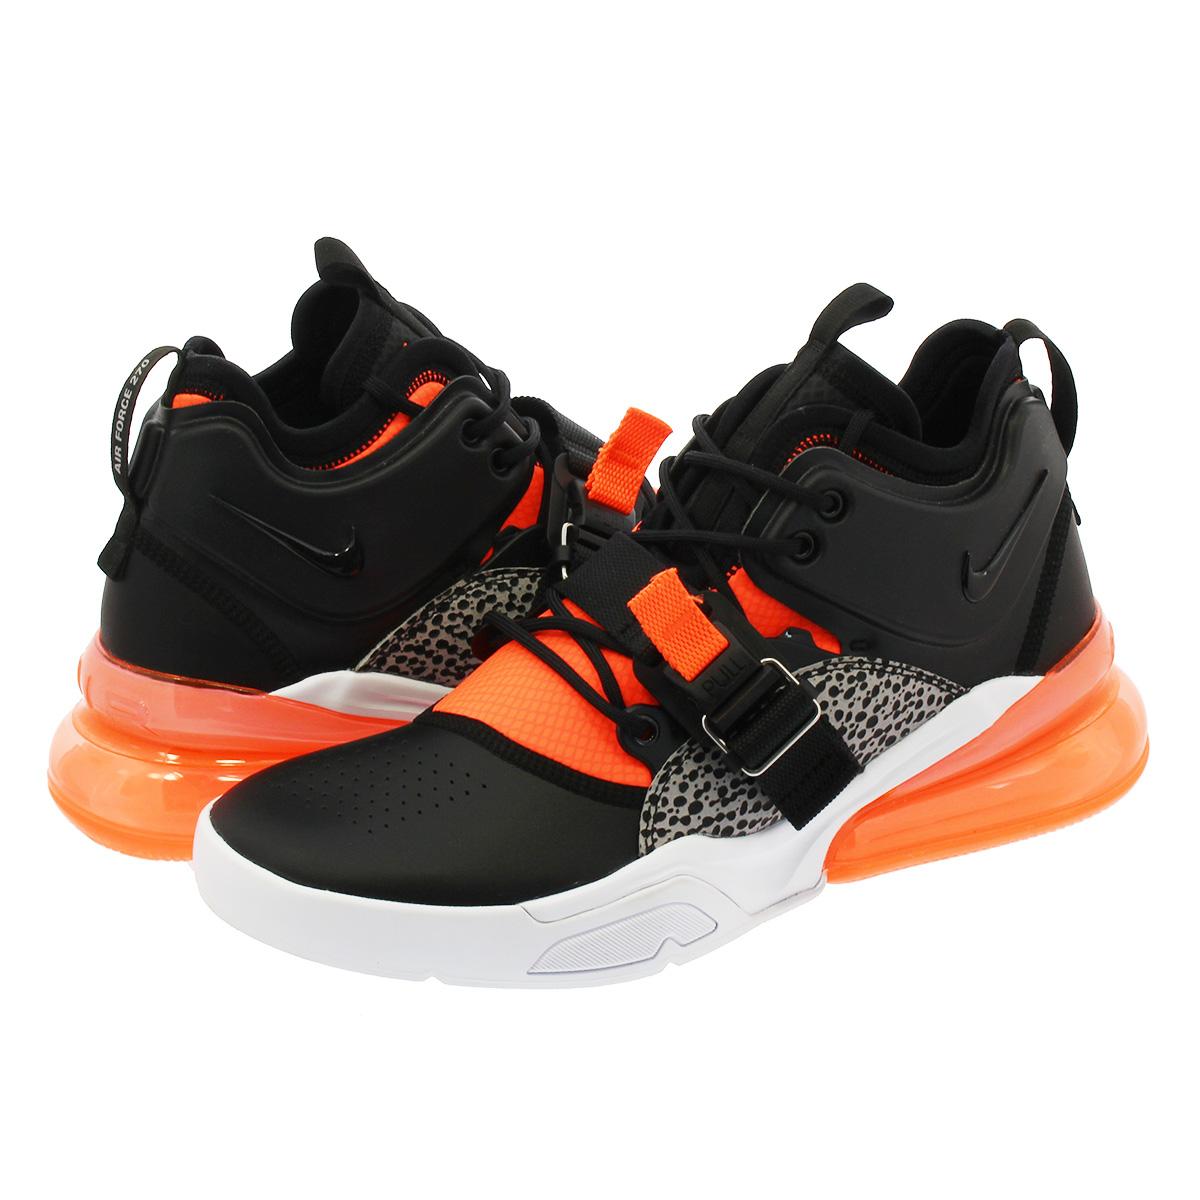 sports shoes f67a7 794fa NIKE AIR FORCE 270 Nike air force 270 BLACK HYPER CRIMSON WOLF GREY WHITE